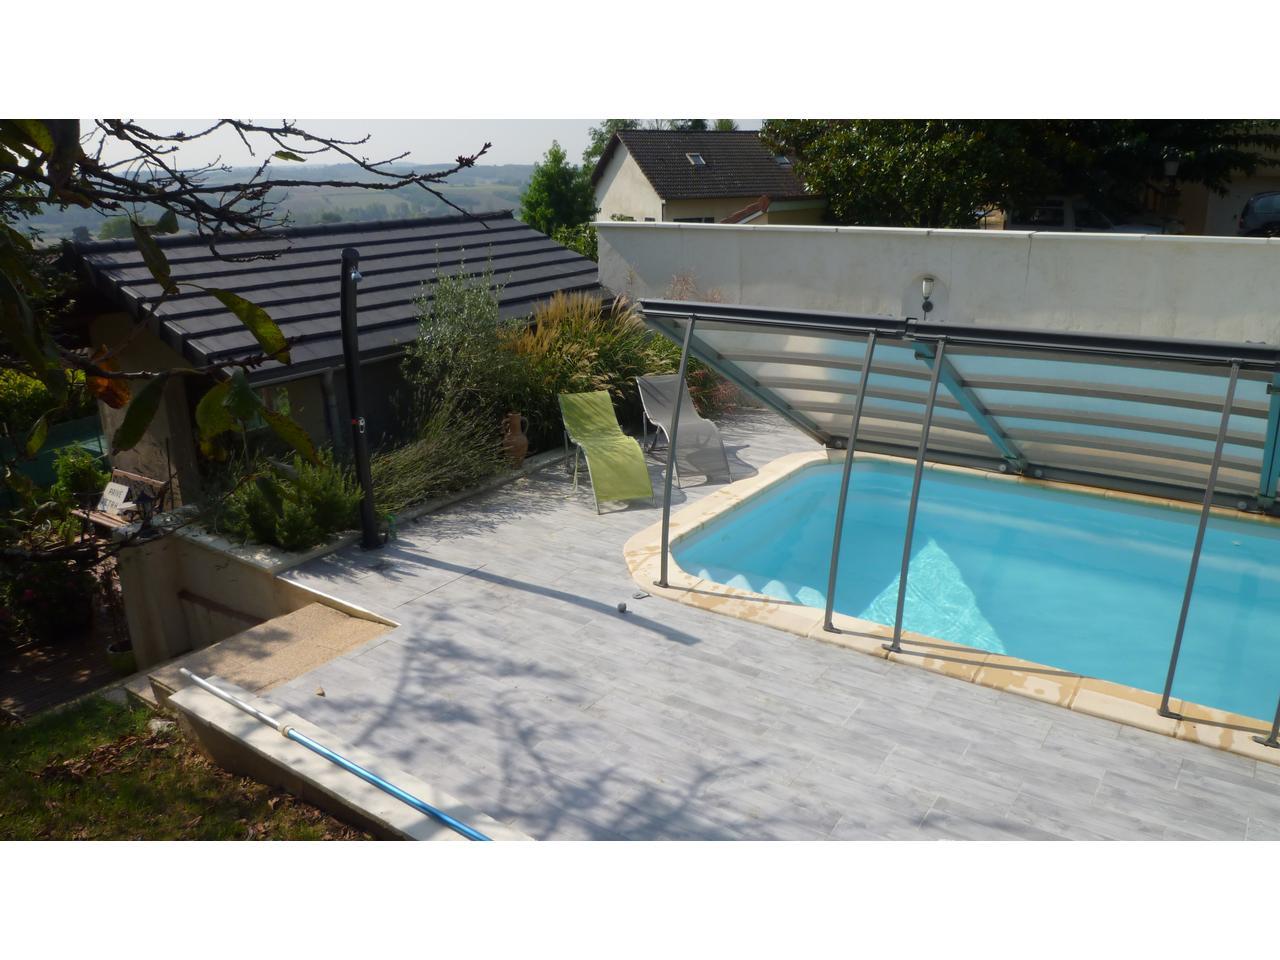 annonce vente villa chaponnay 69970 140 m 385 000 992738524131. Black Bedroom Furniture Sets. Home Design Ideas